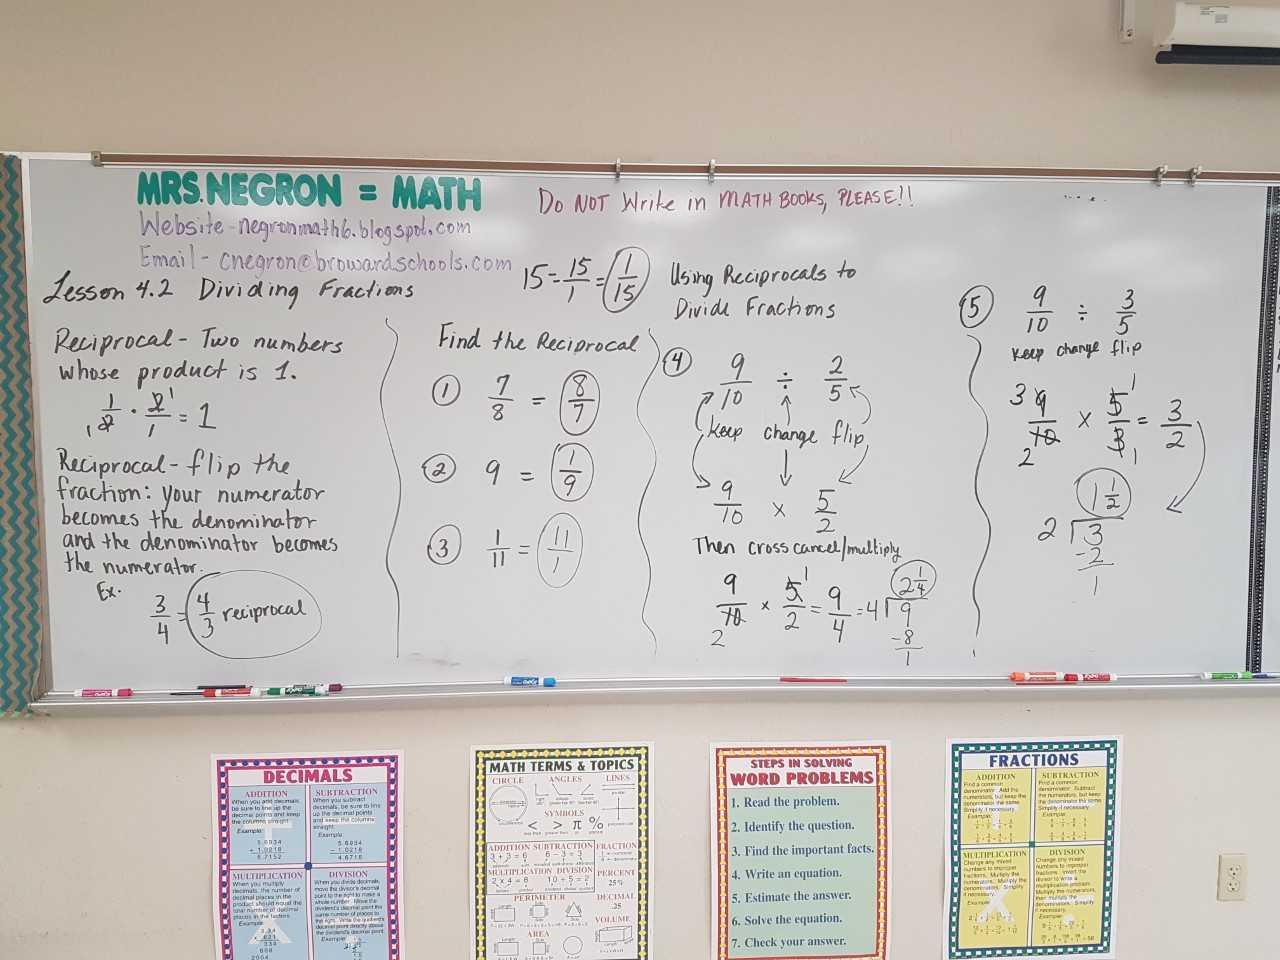 Mrs Negron 6th Grade Math Class Lesson 4 2 Dividing Fractions